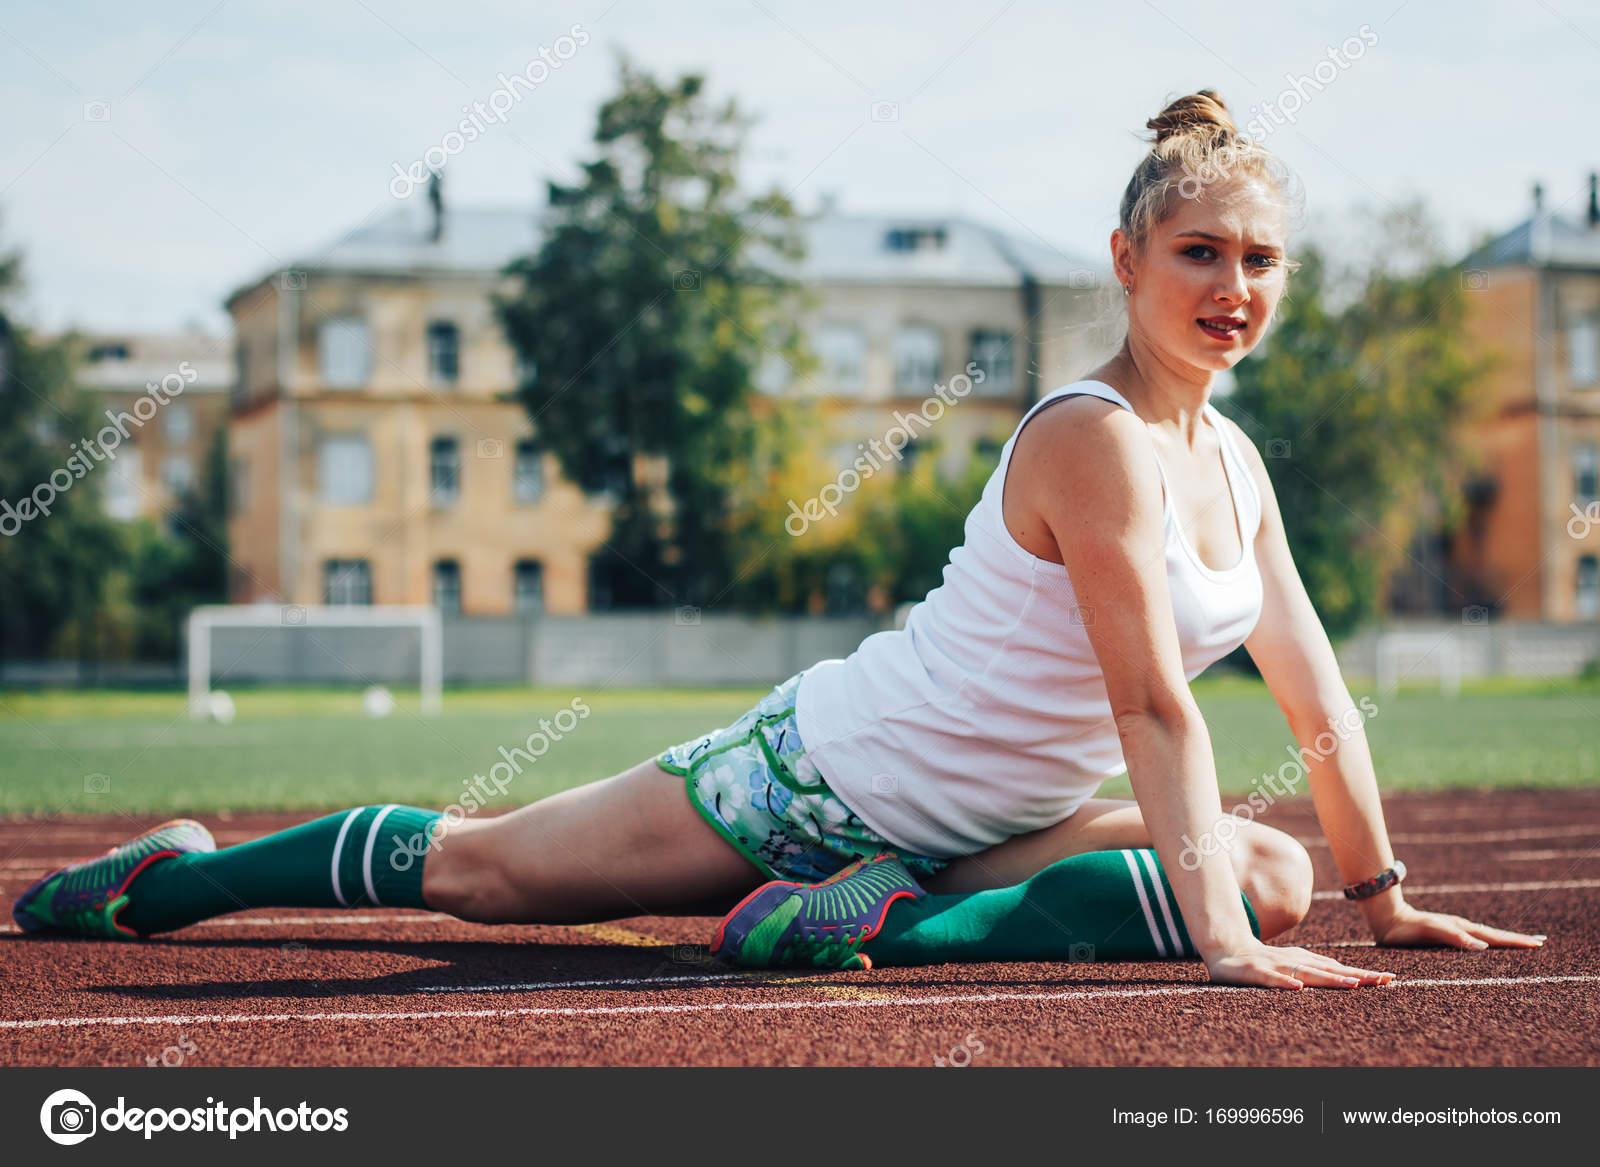 c429805cd64 Αθλήτρια αθλητικές ασκήσεις στο γήπεδο σε μια καλοκαιρινή μέρα — Εικόνα από  ...